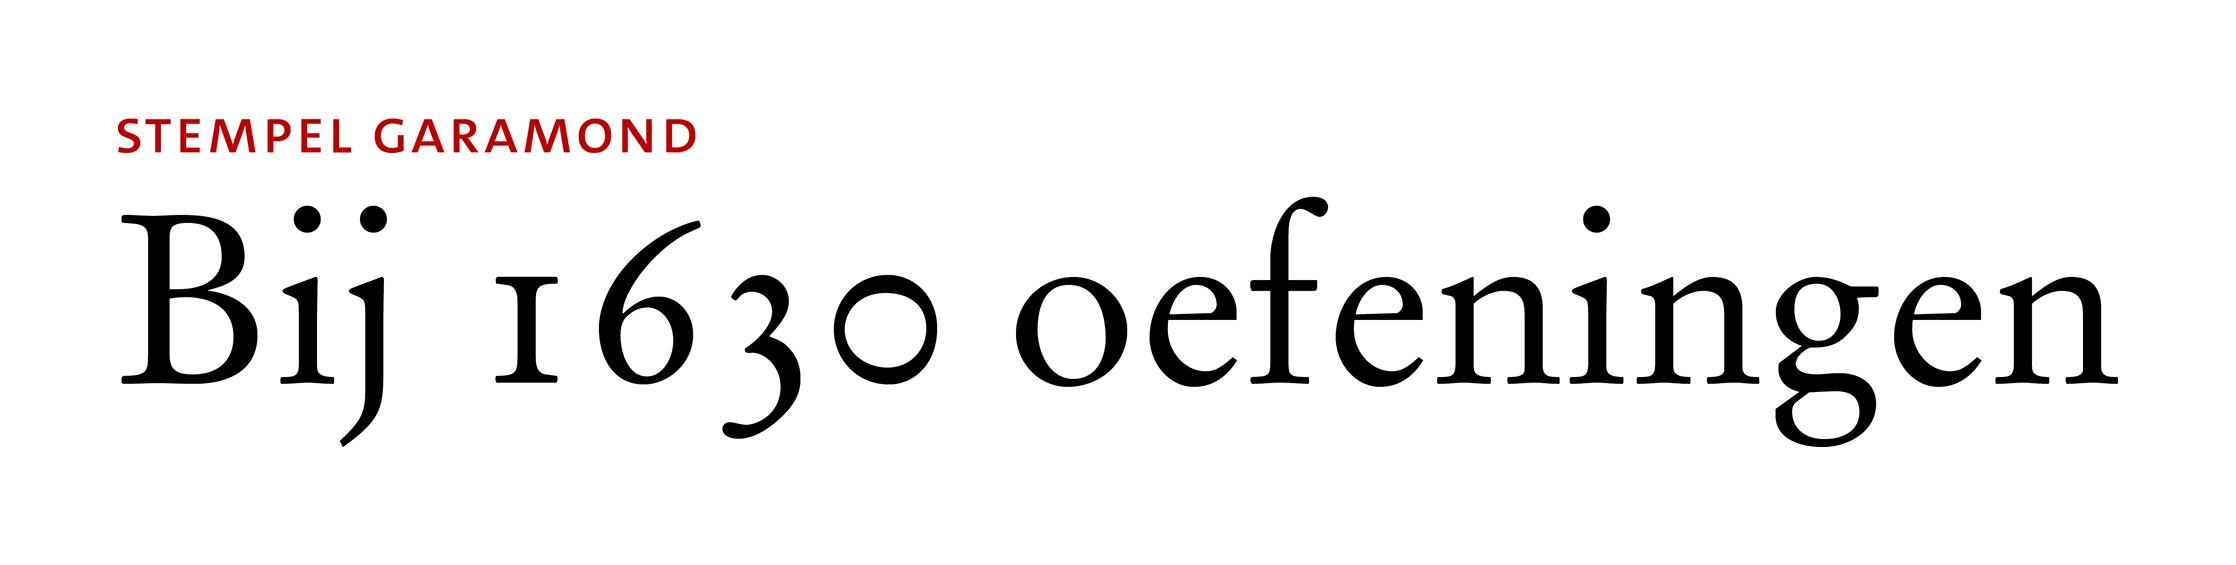 Identical zero and oh glyphs